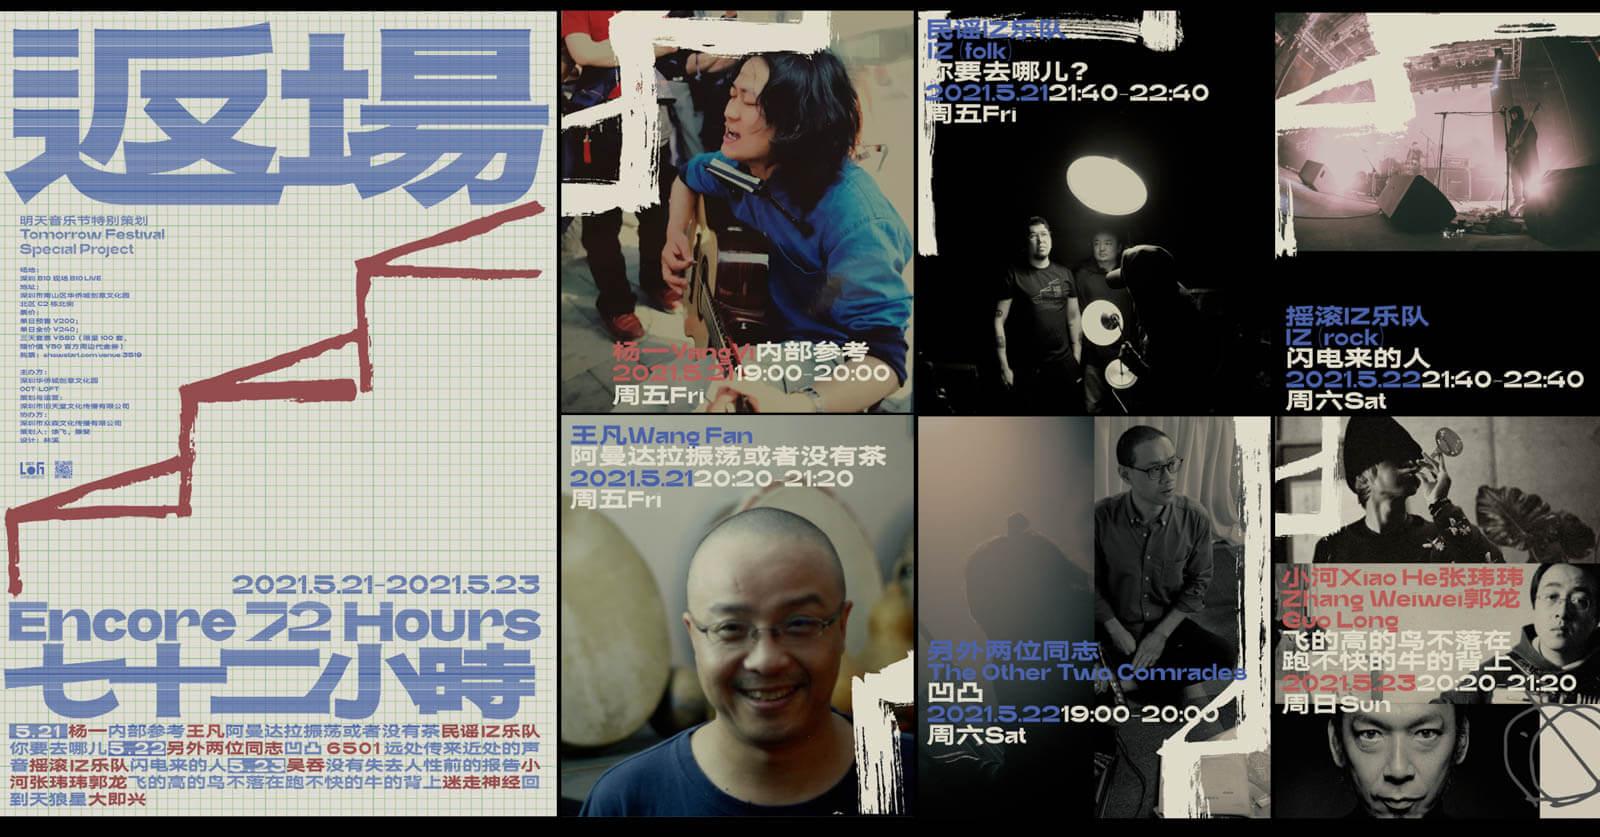 2021 OCT-LOFT 音楽祭「Tomorrow Festival」開催! (5/21-23)